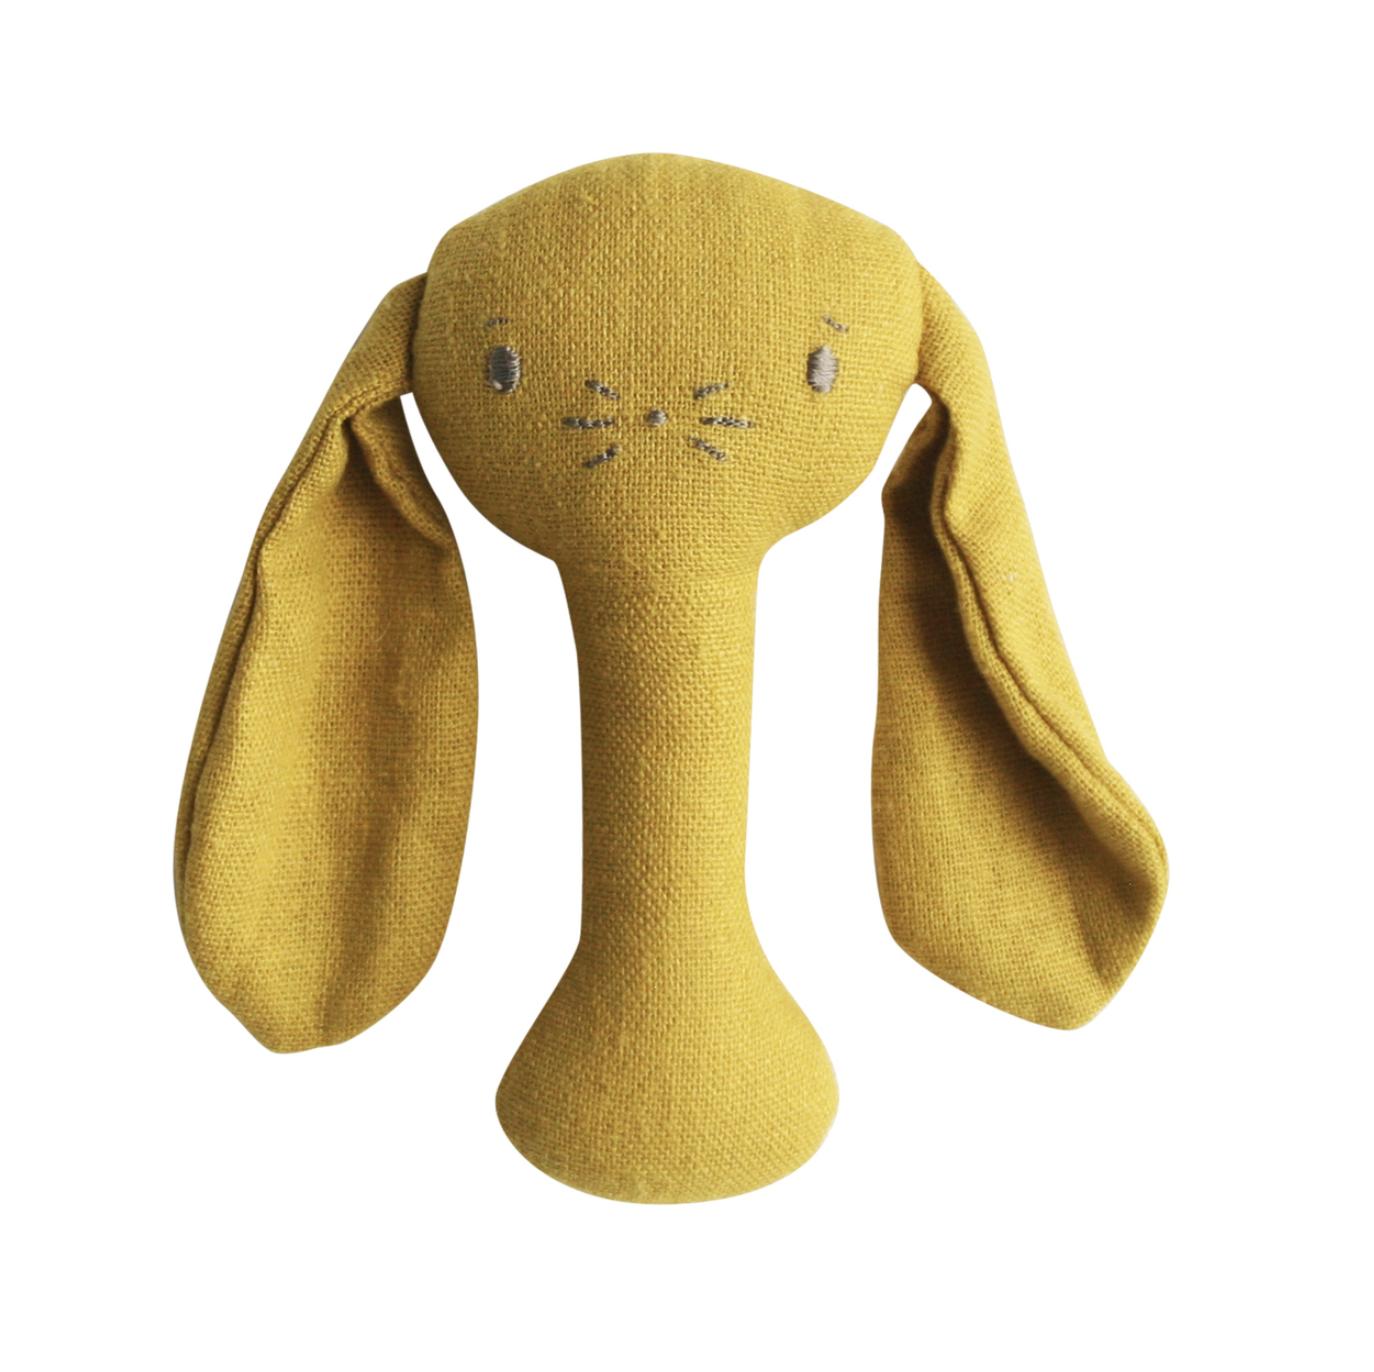 Alimrose Bunny Stick Rattle - Butterscotch